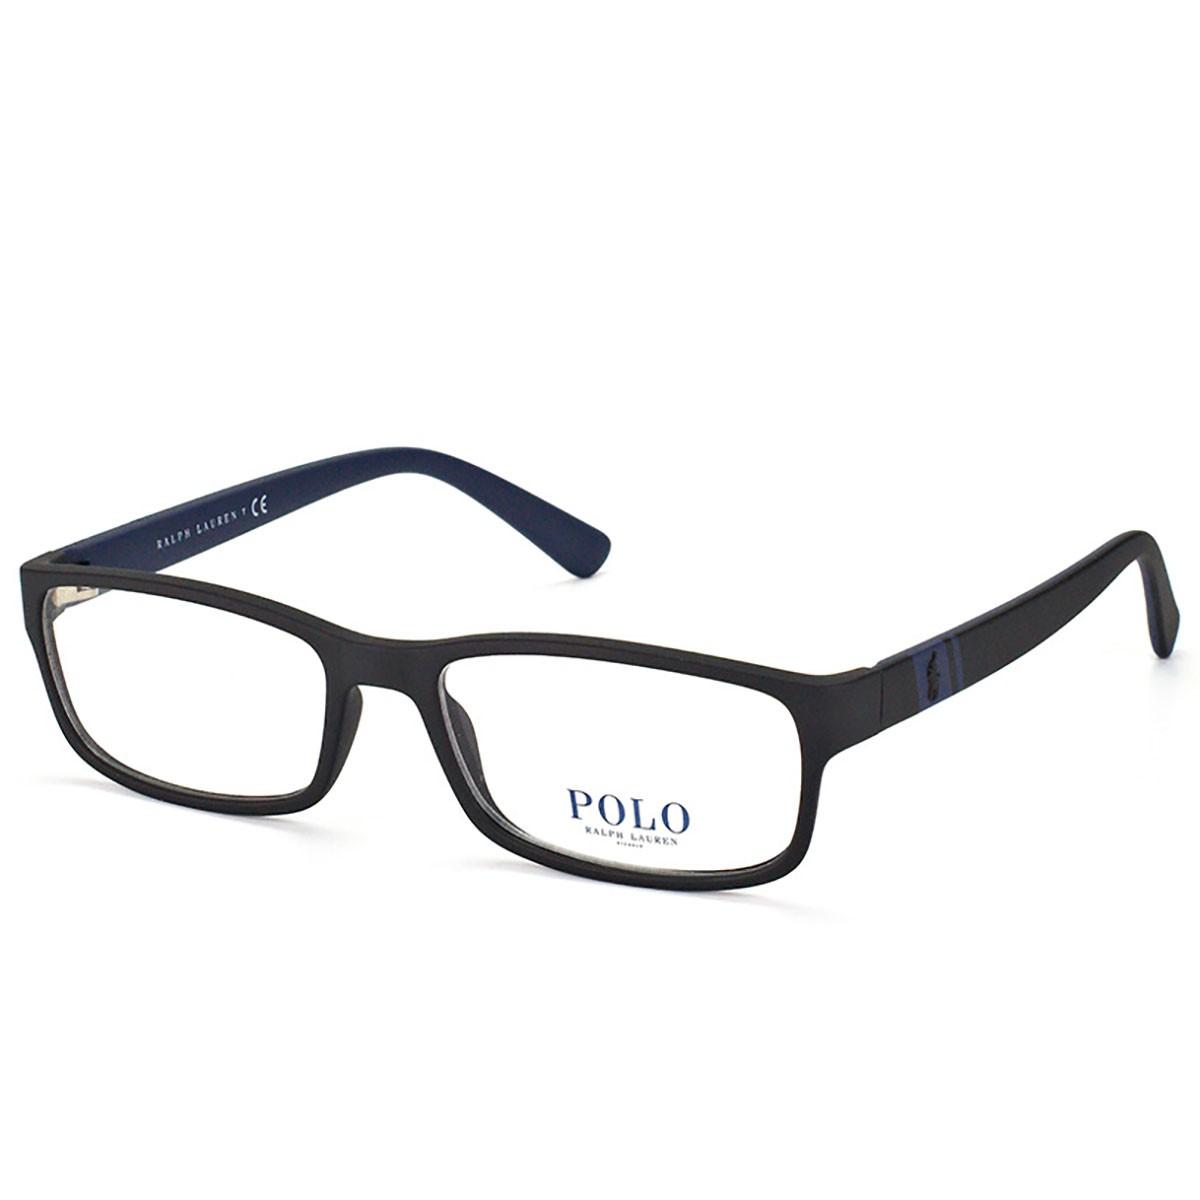 fac887a2dfe61 Óculos de Grau Polo Ralph Lauren PH2154